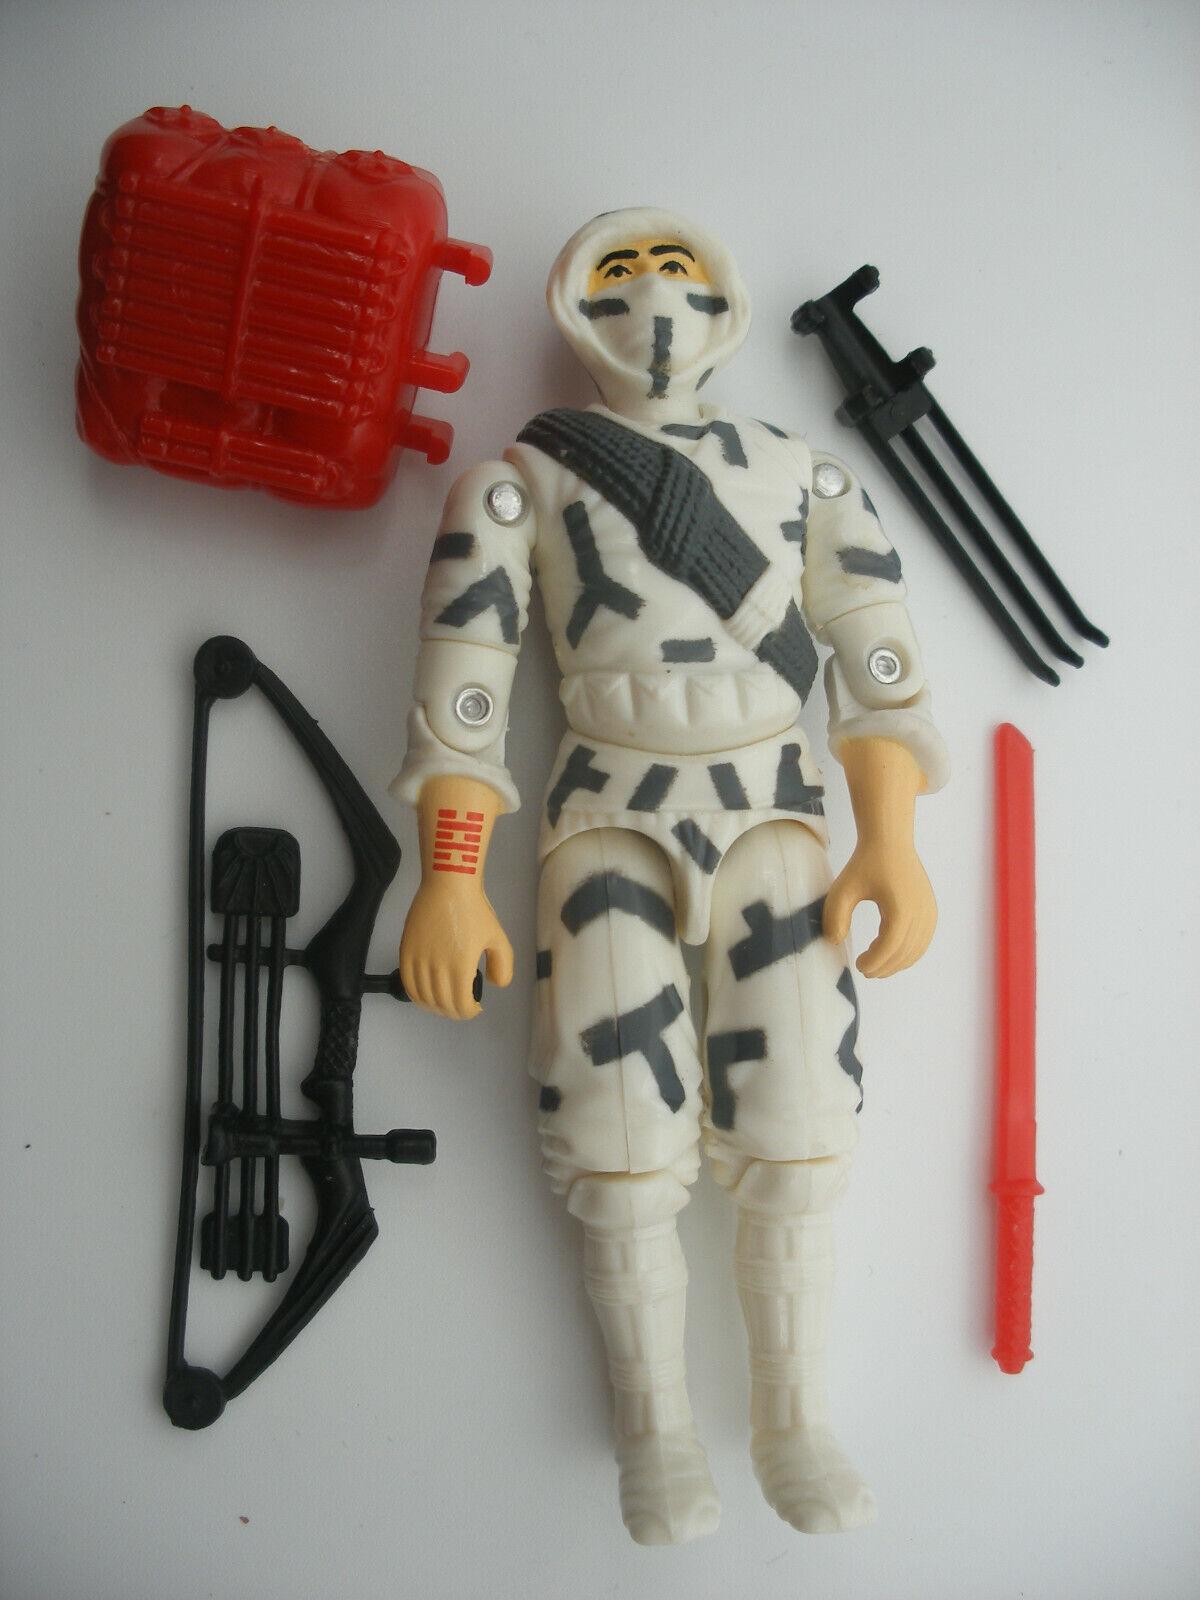 Hasbro gijoe GI joe ORIGINAL vintage figure 1988 STORM SHADOW TORNADE complet